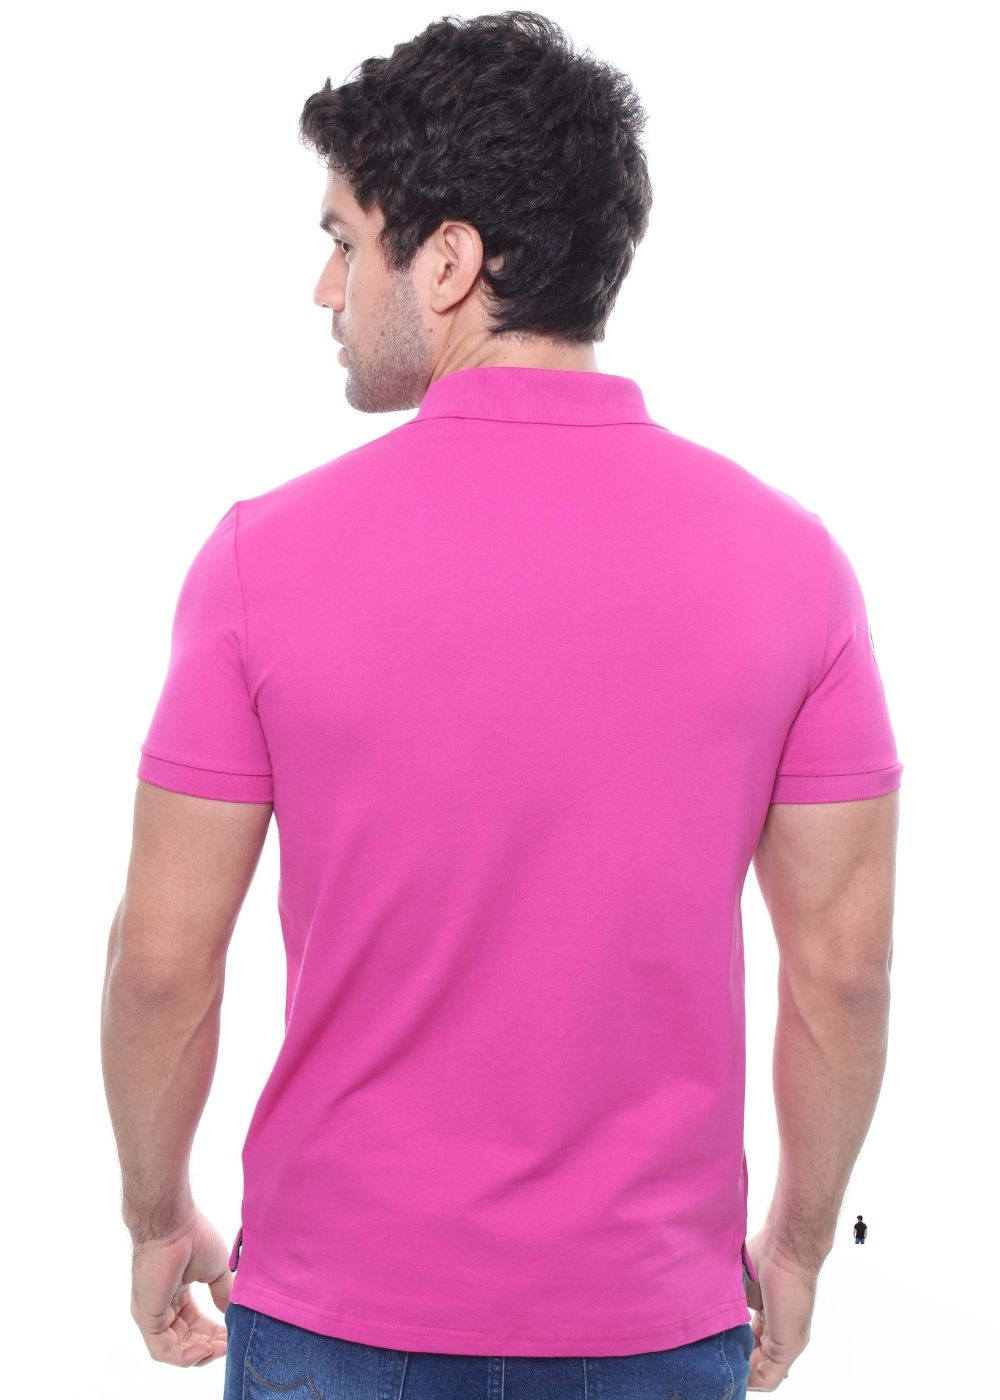 Camisa Gola Polo Piquet Bordada Crocker - 47173  - CROCKER JEANS